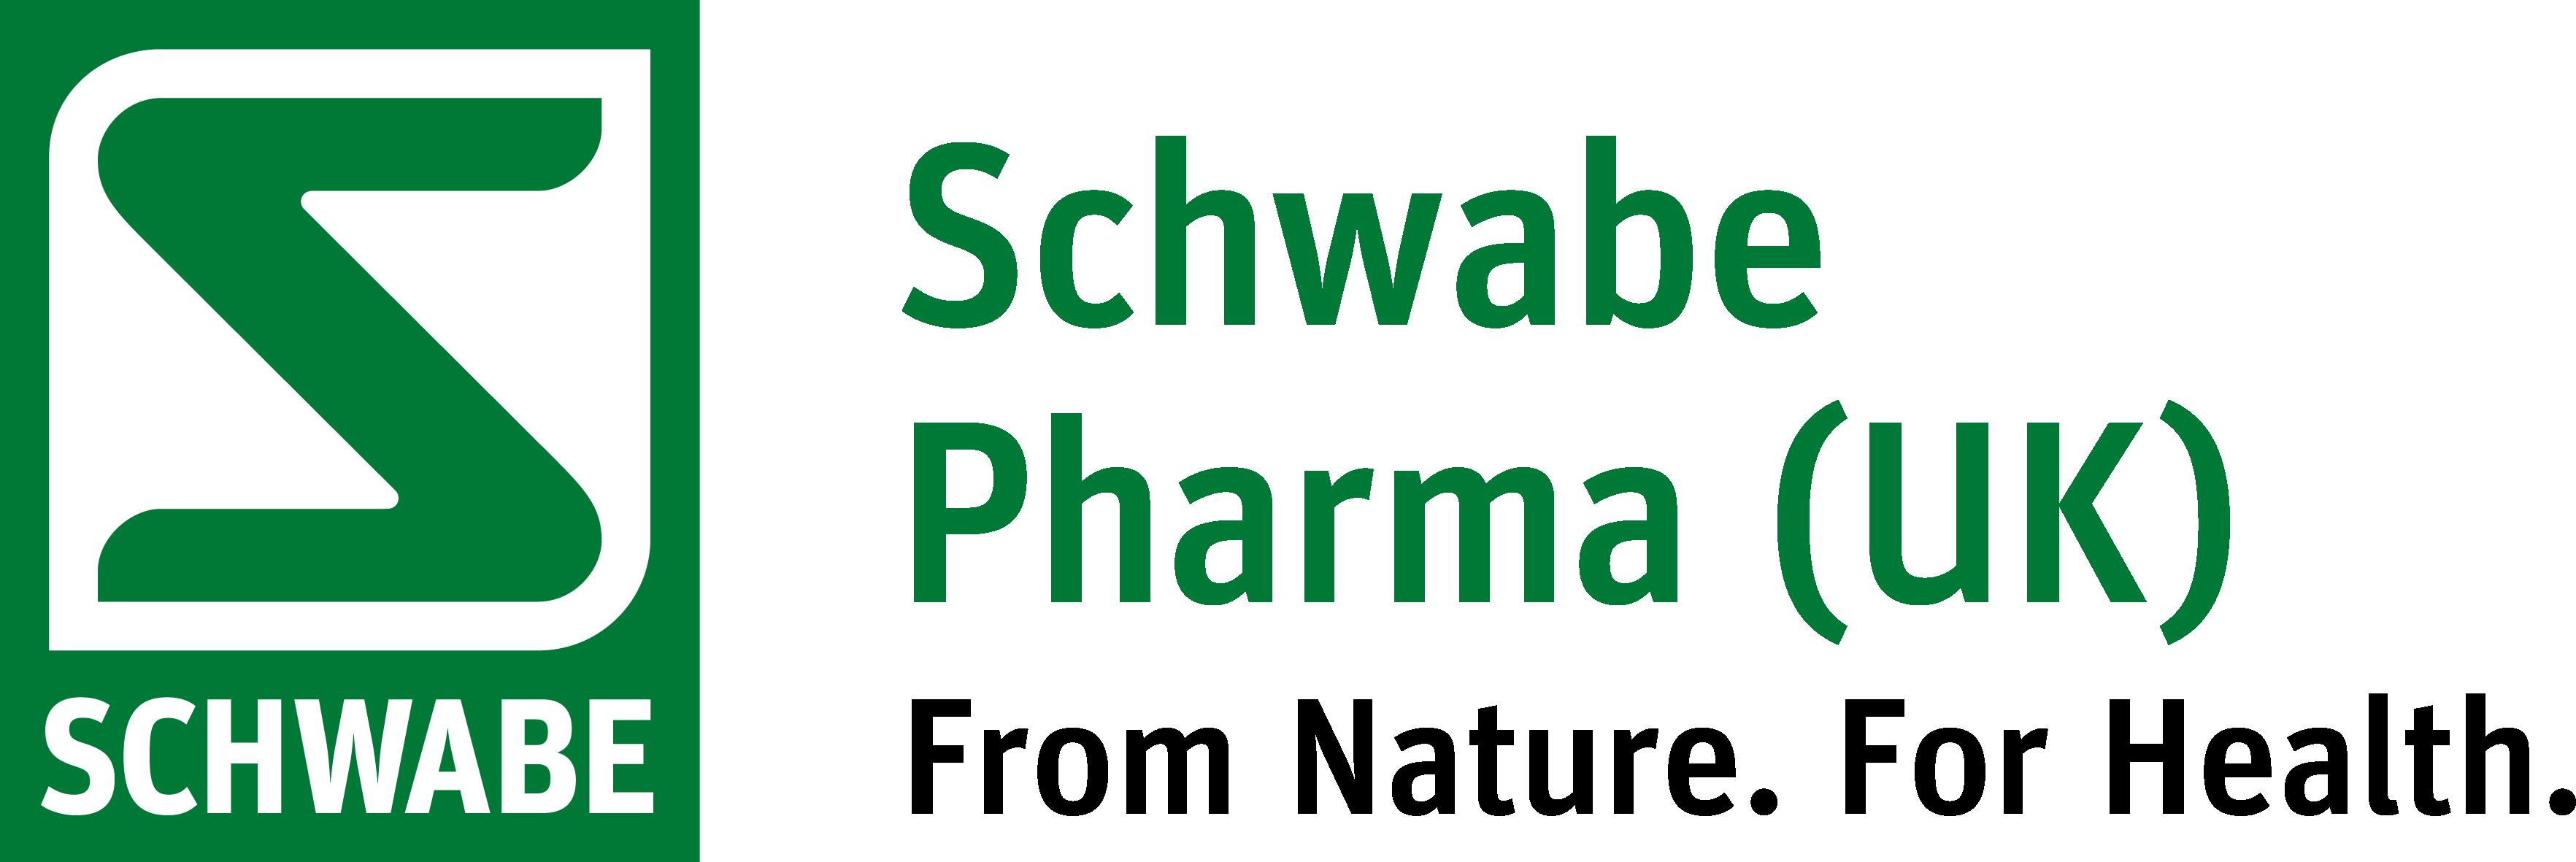 Schwabe-PharmaUK